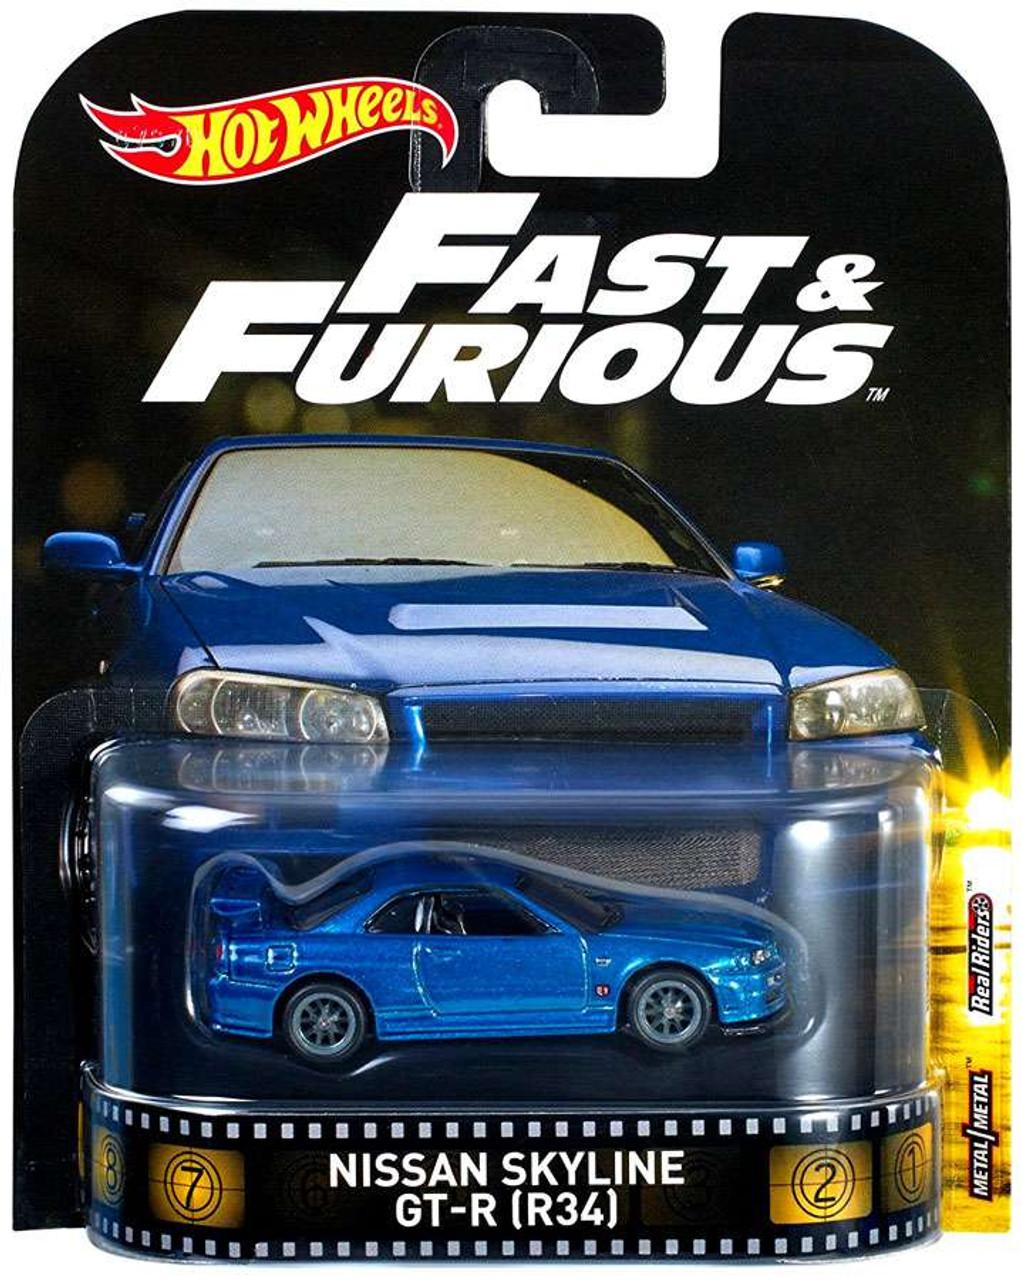 Hot Wheels Fast Furious Nissan Skyline Gt R R34 Die Cast Car Mattel